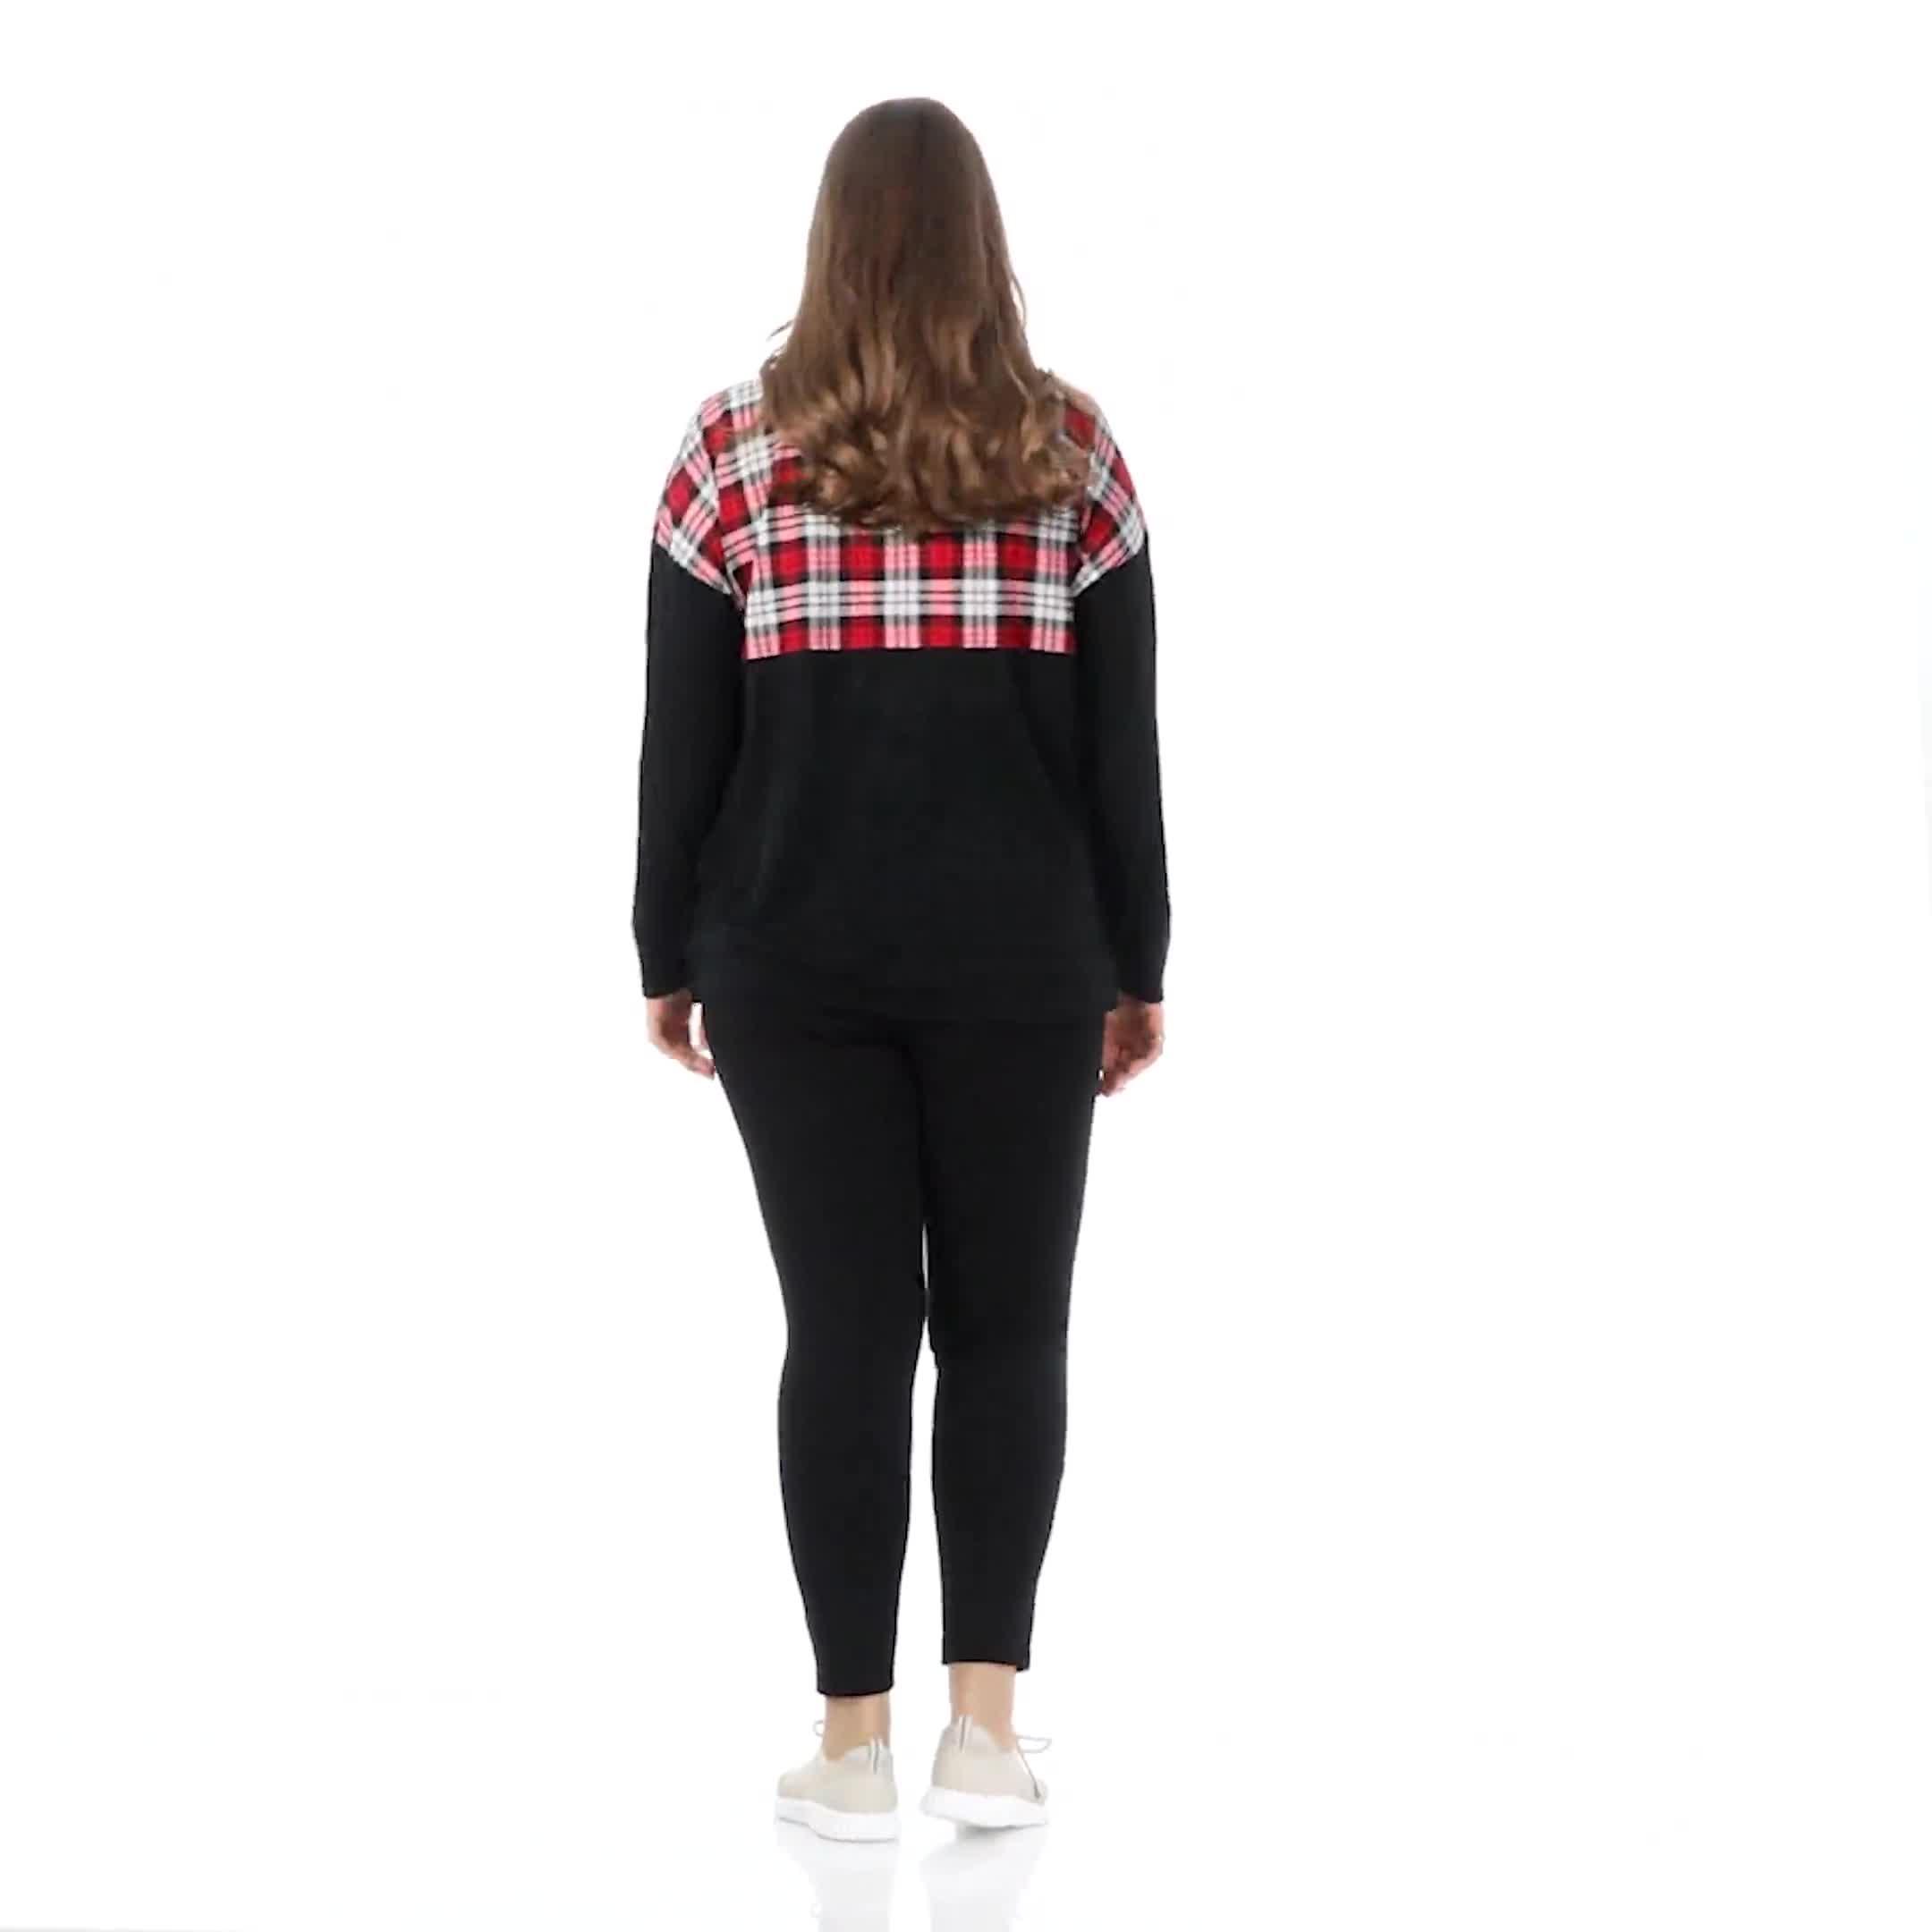 Westport Hacci Sweater Knit Color Block Top - Plus - Video